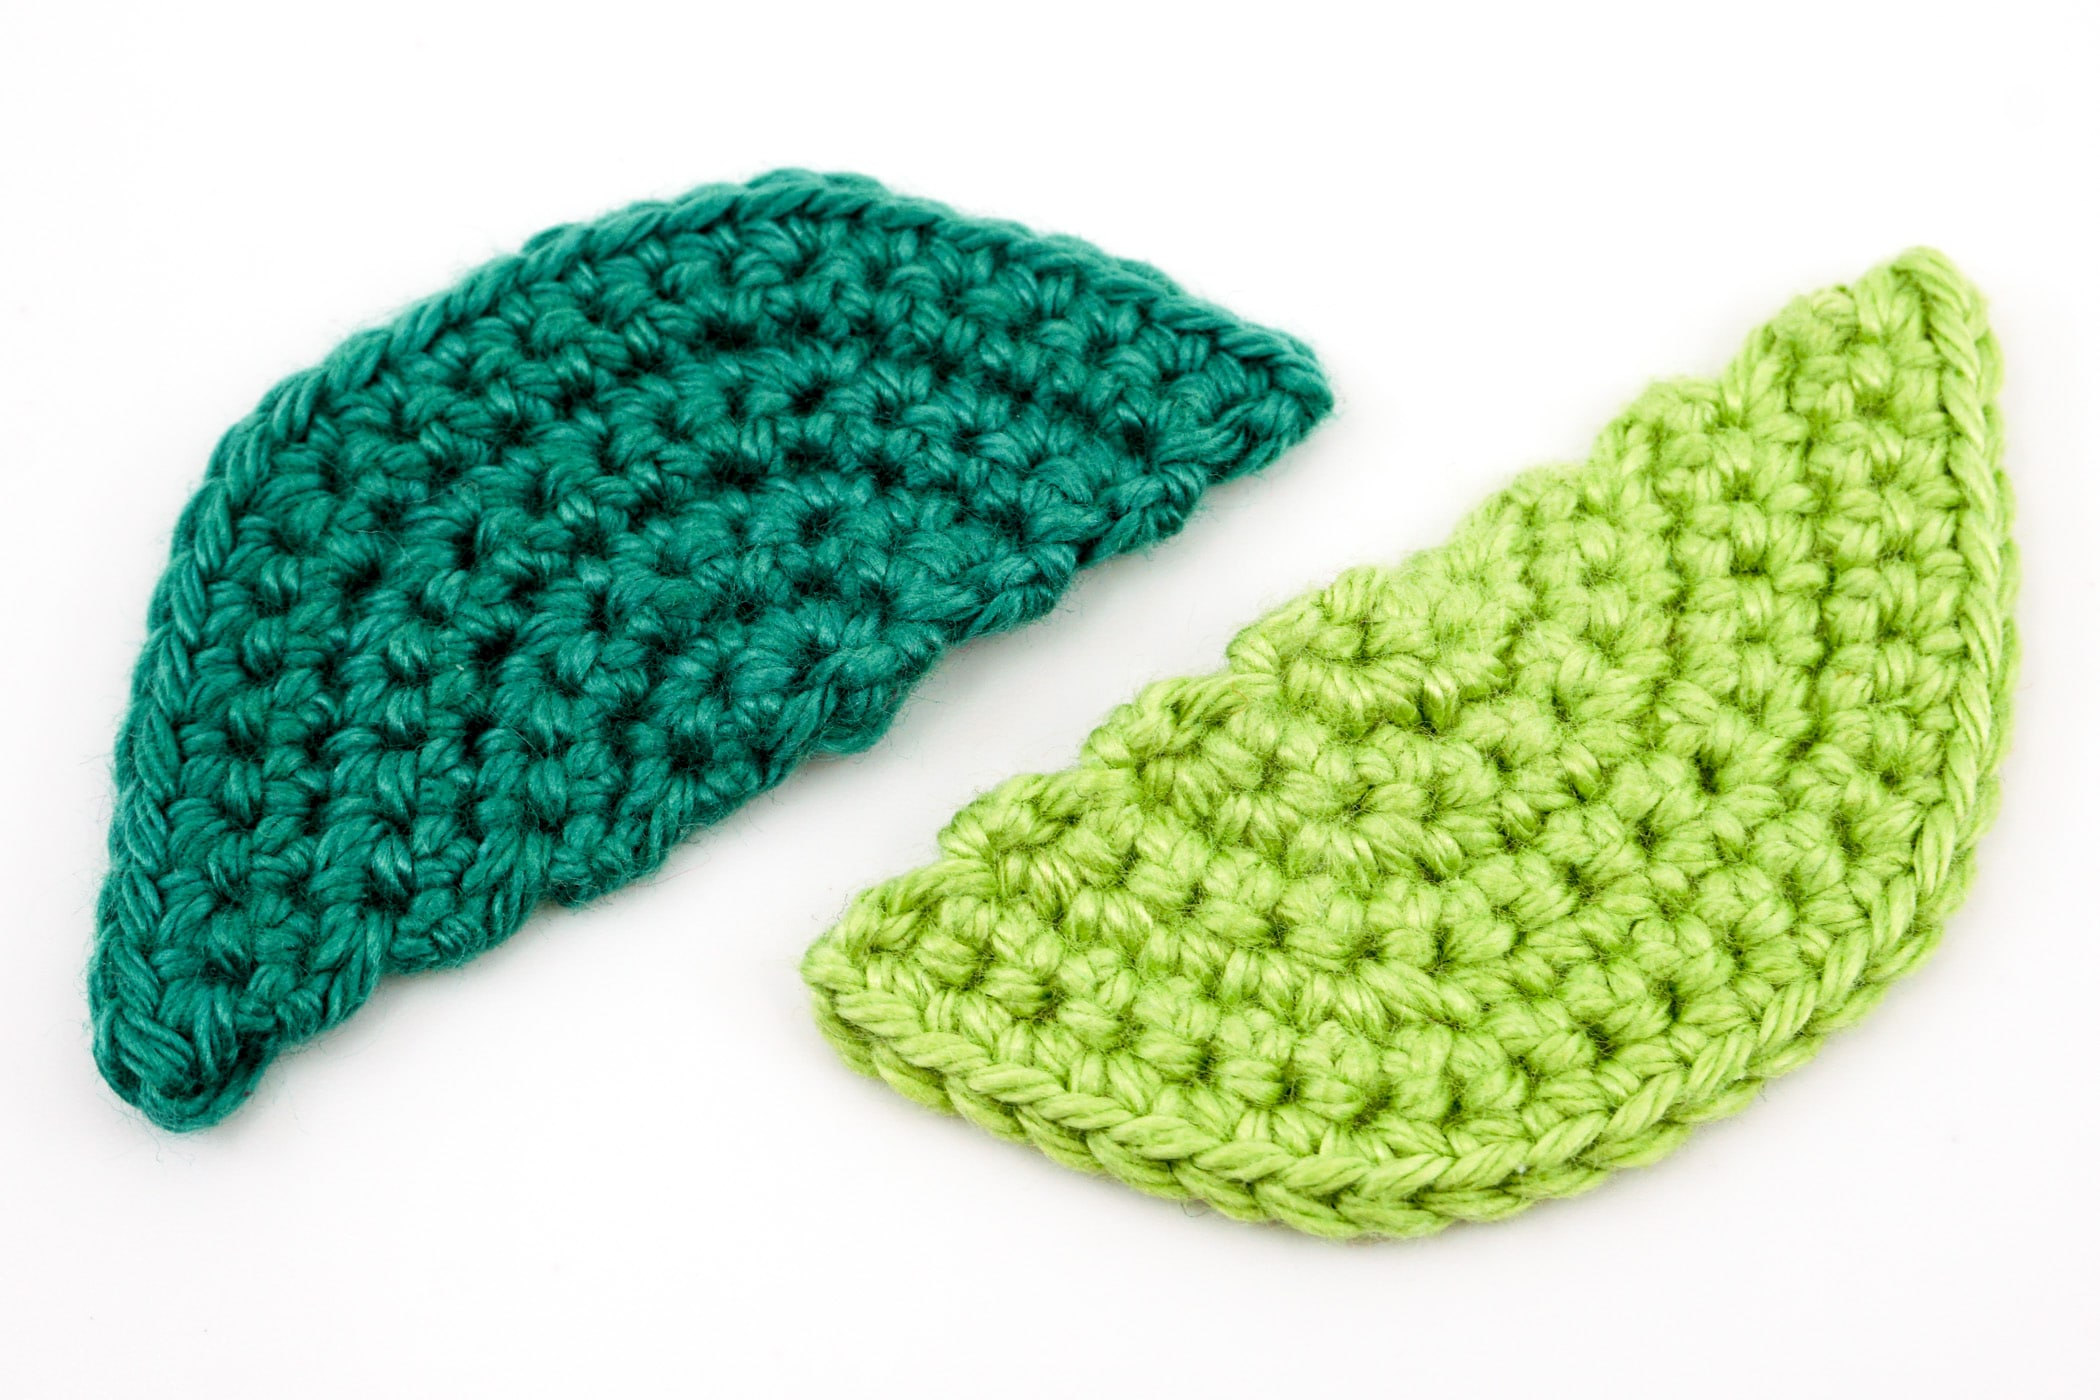 abril, 2016 | Crochet.eu - Part 5 | 1400x2100